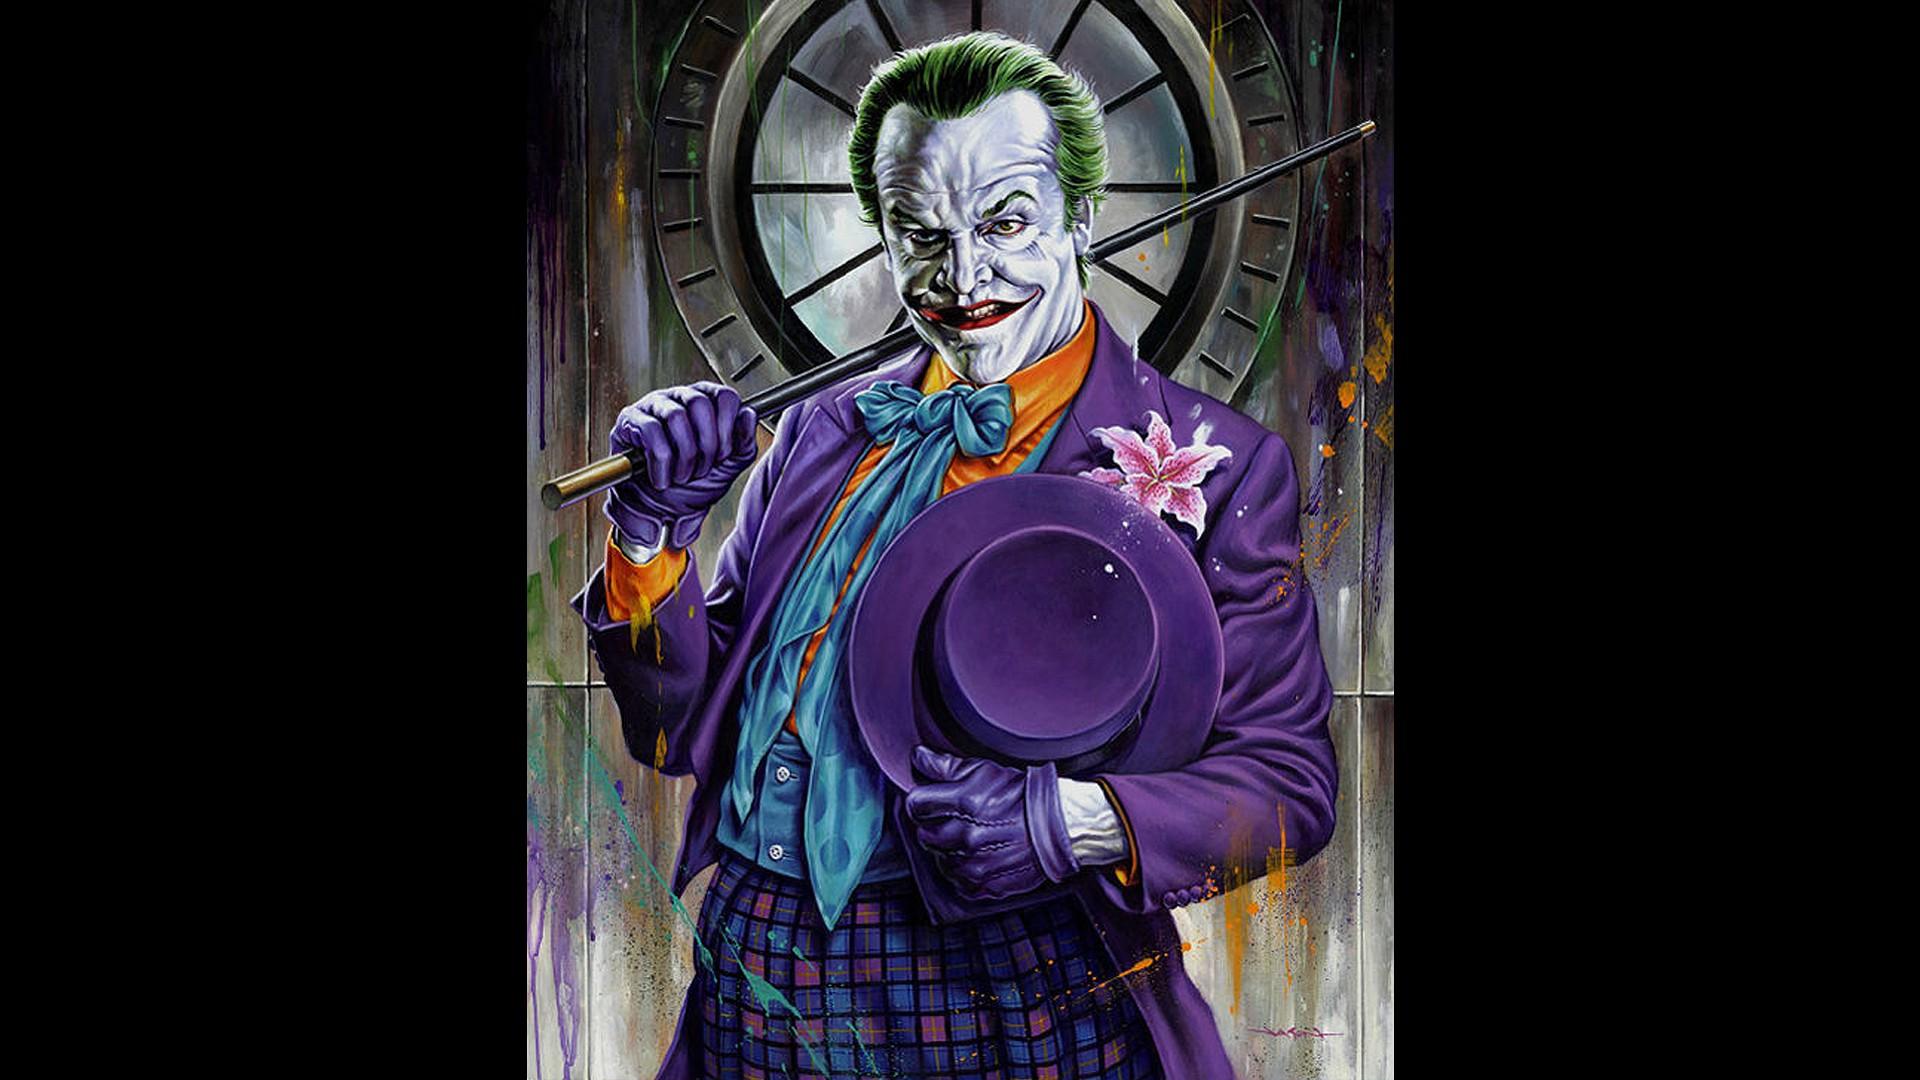 batman movies the joker jack nicholson fan art black background 1920x1080